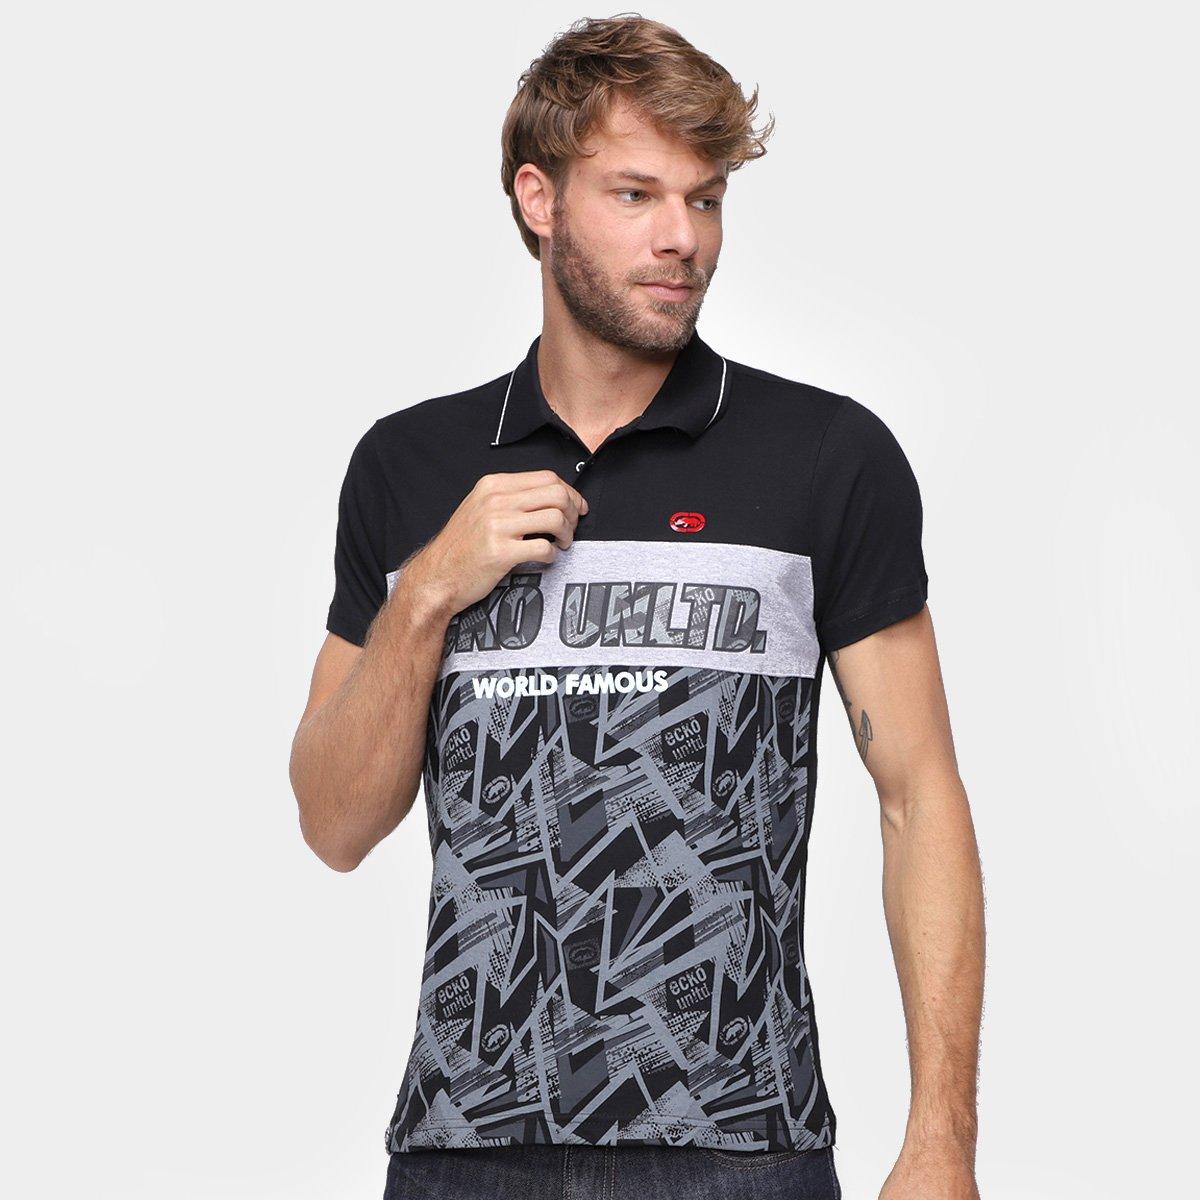 Camisa Polo Ecko World Famous Masculina